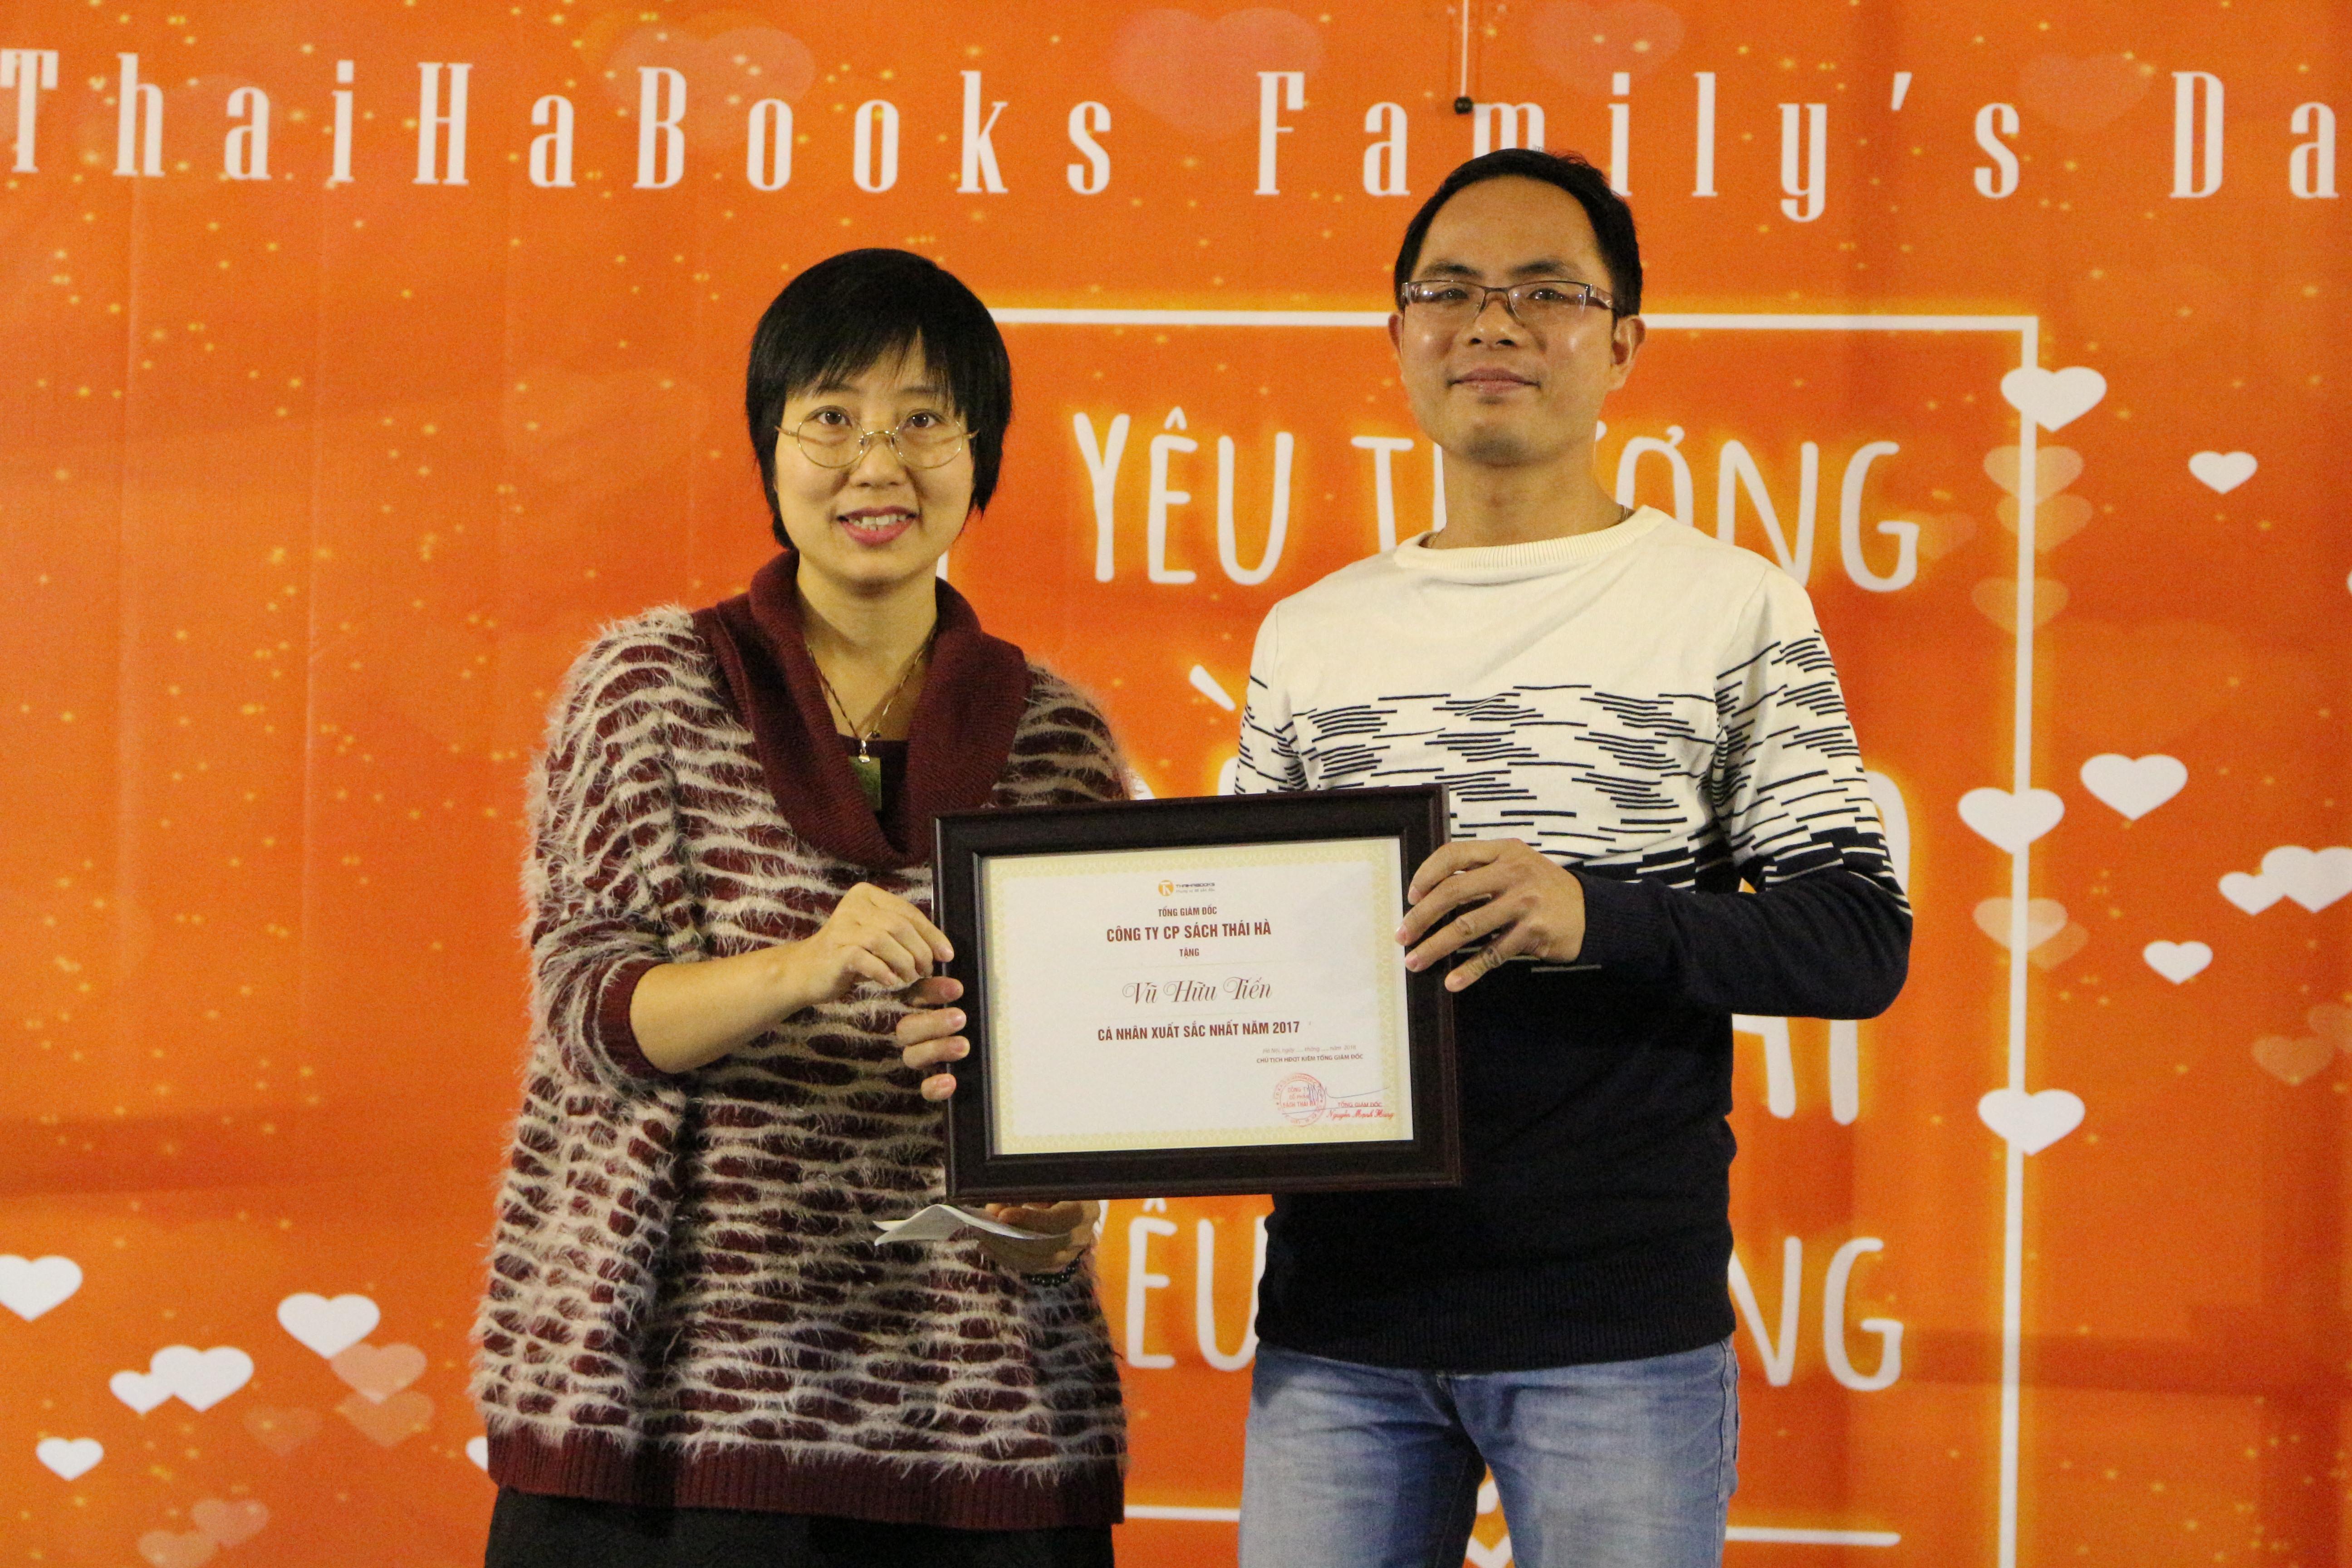 Vu Huu Tien ThaiHaBooks